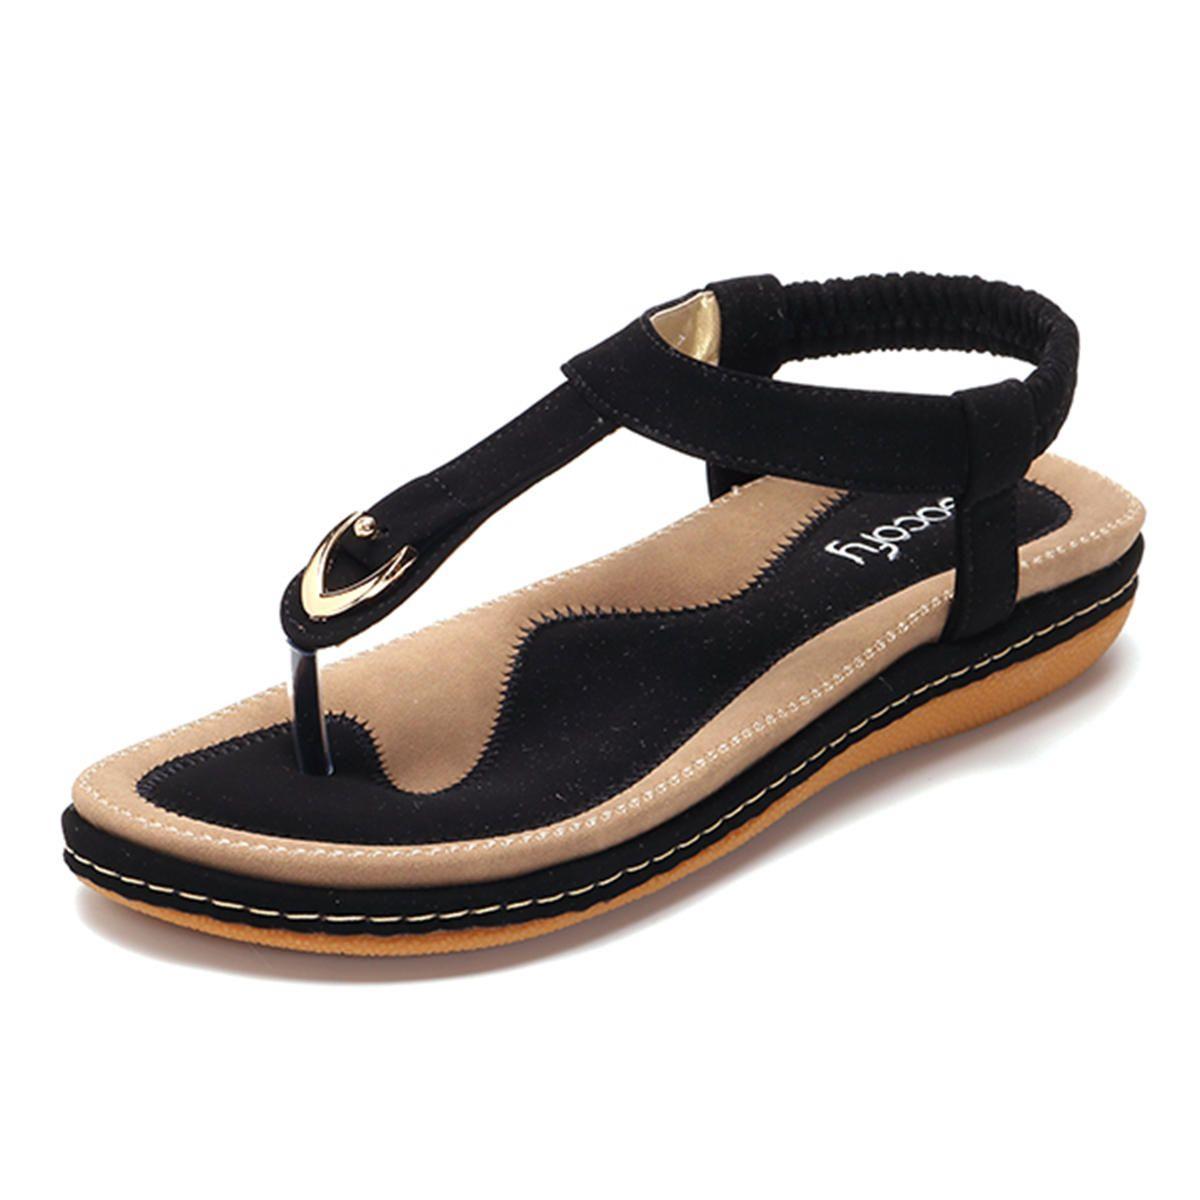 SOCOFY Comfortable Shoes Elastic Clip